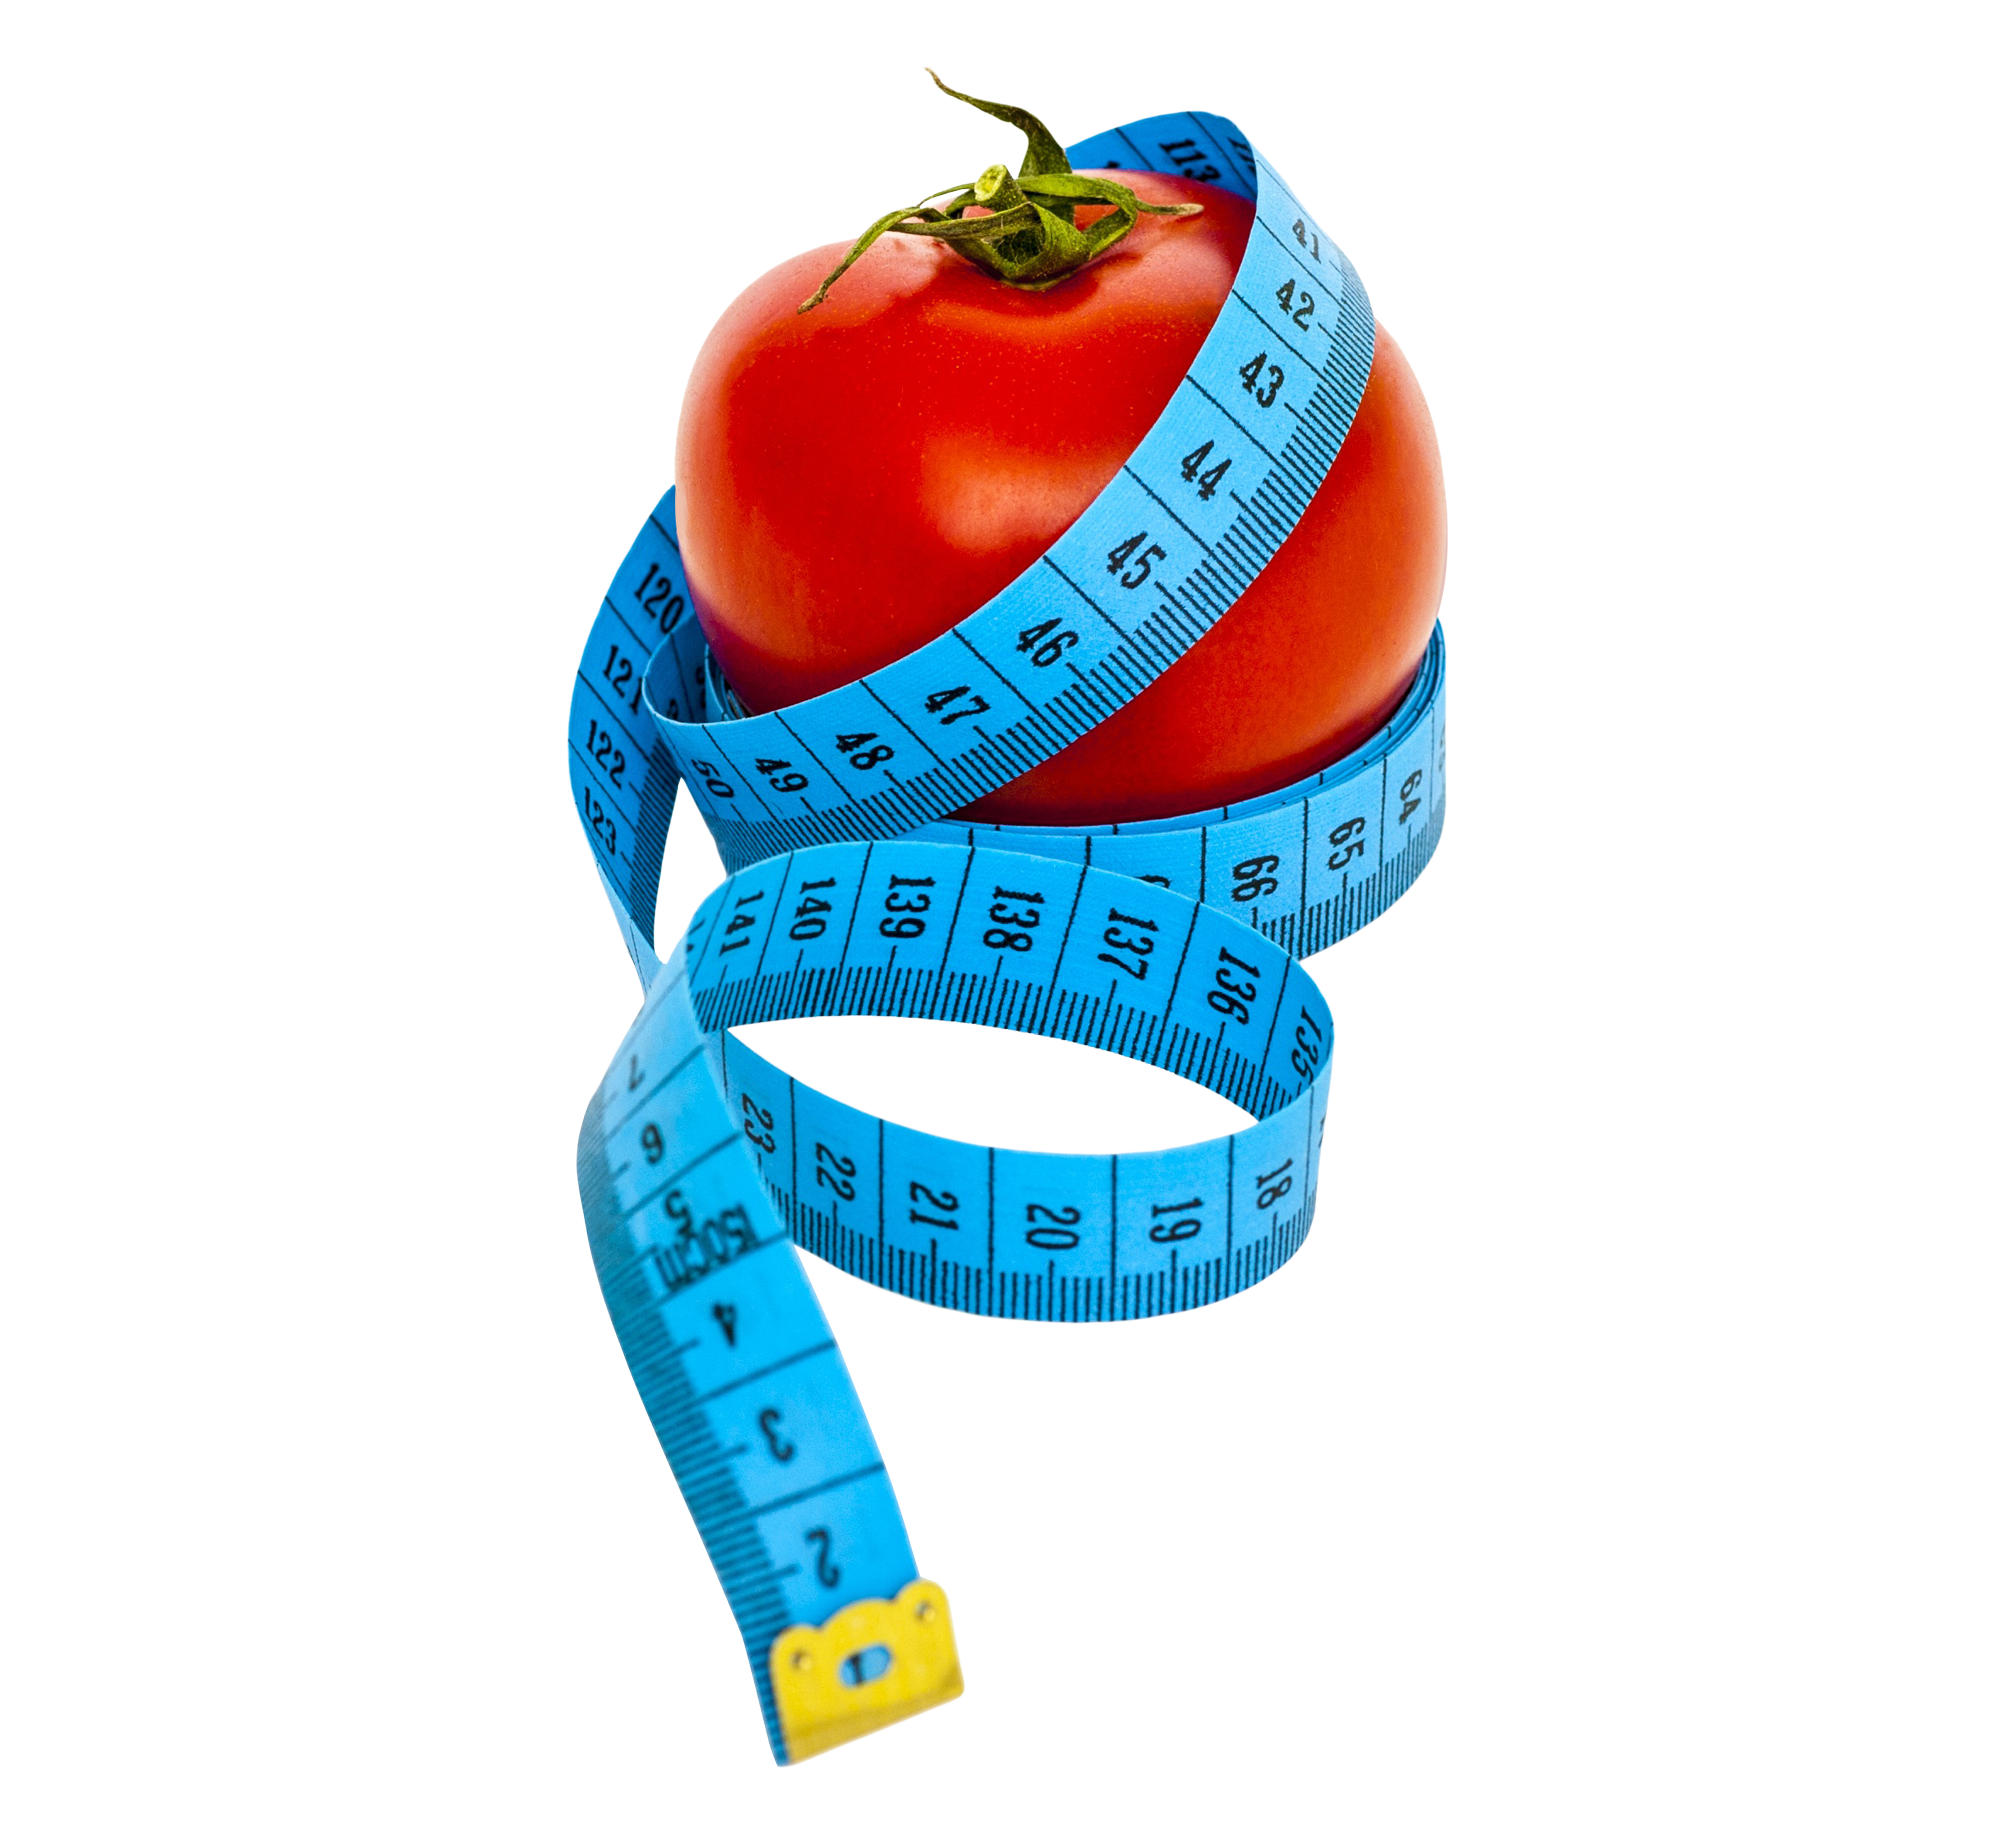 Tomato Diet PNG Transparent Image.